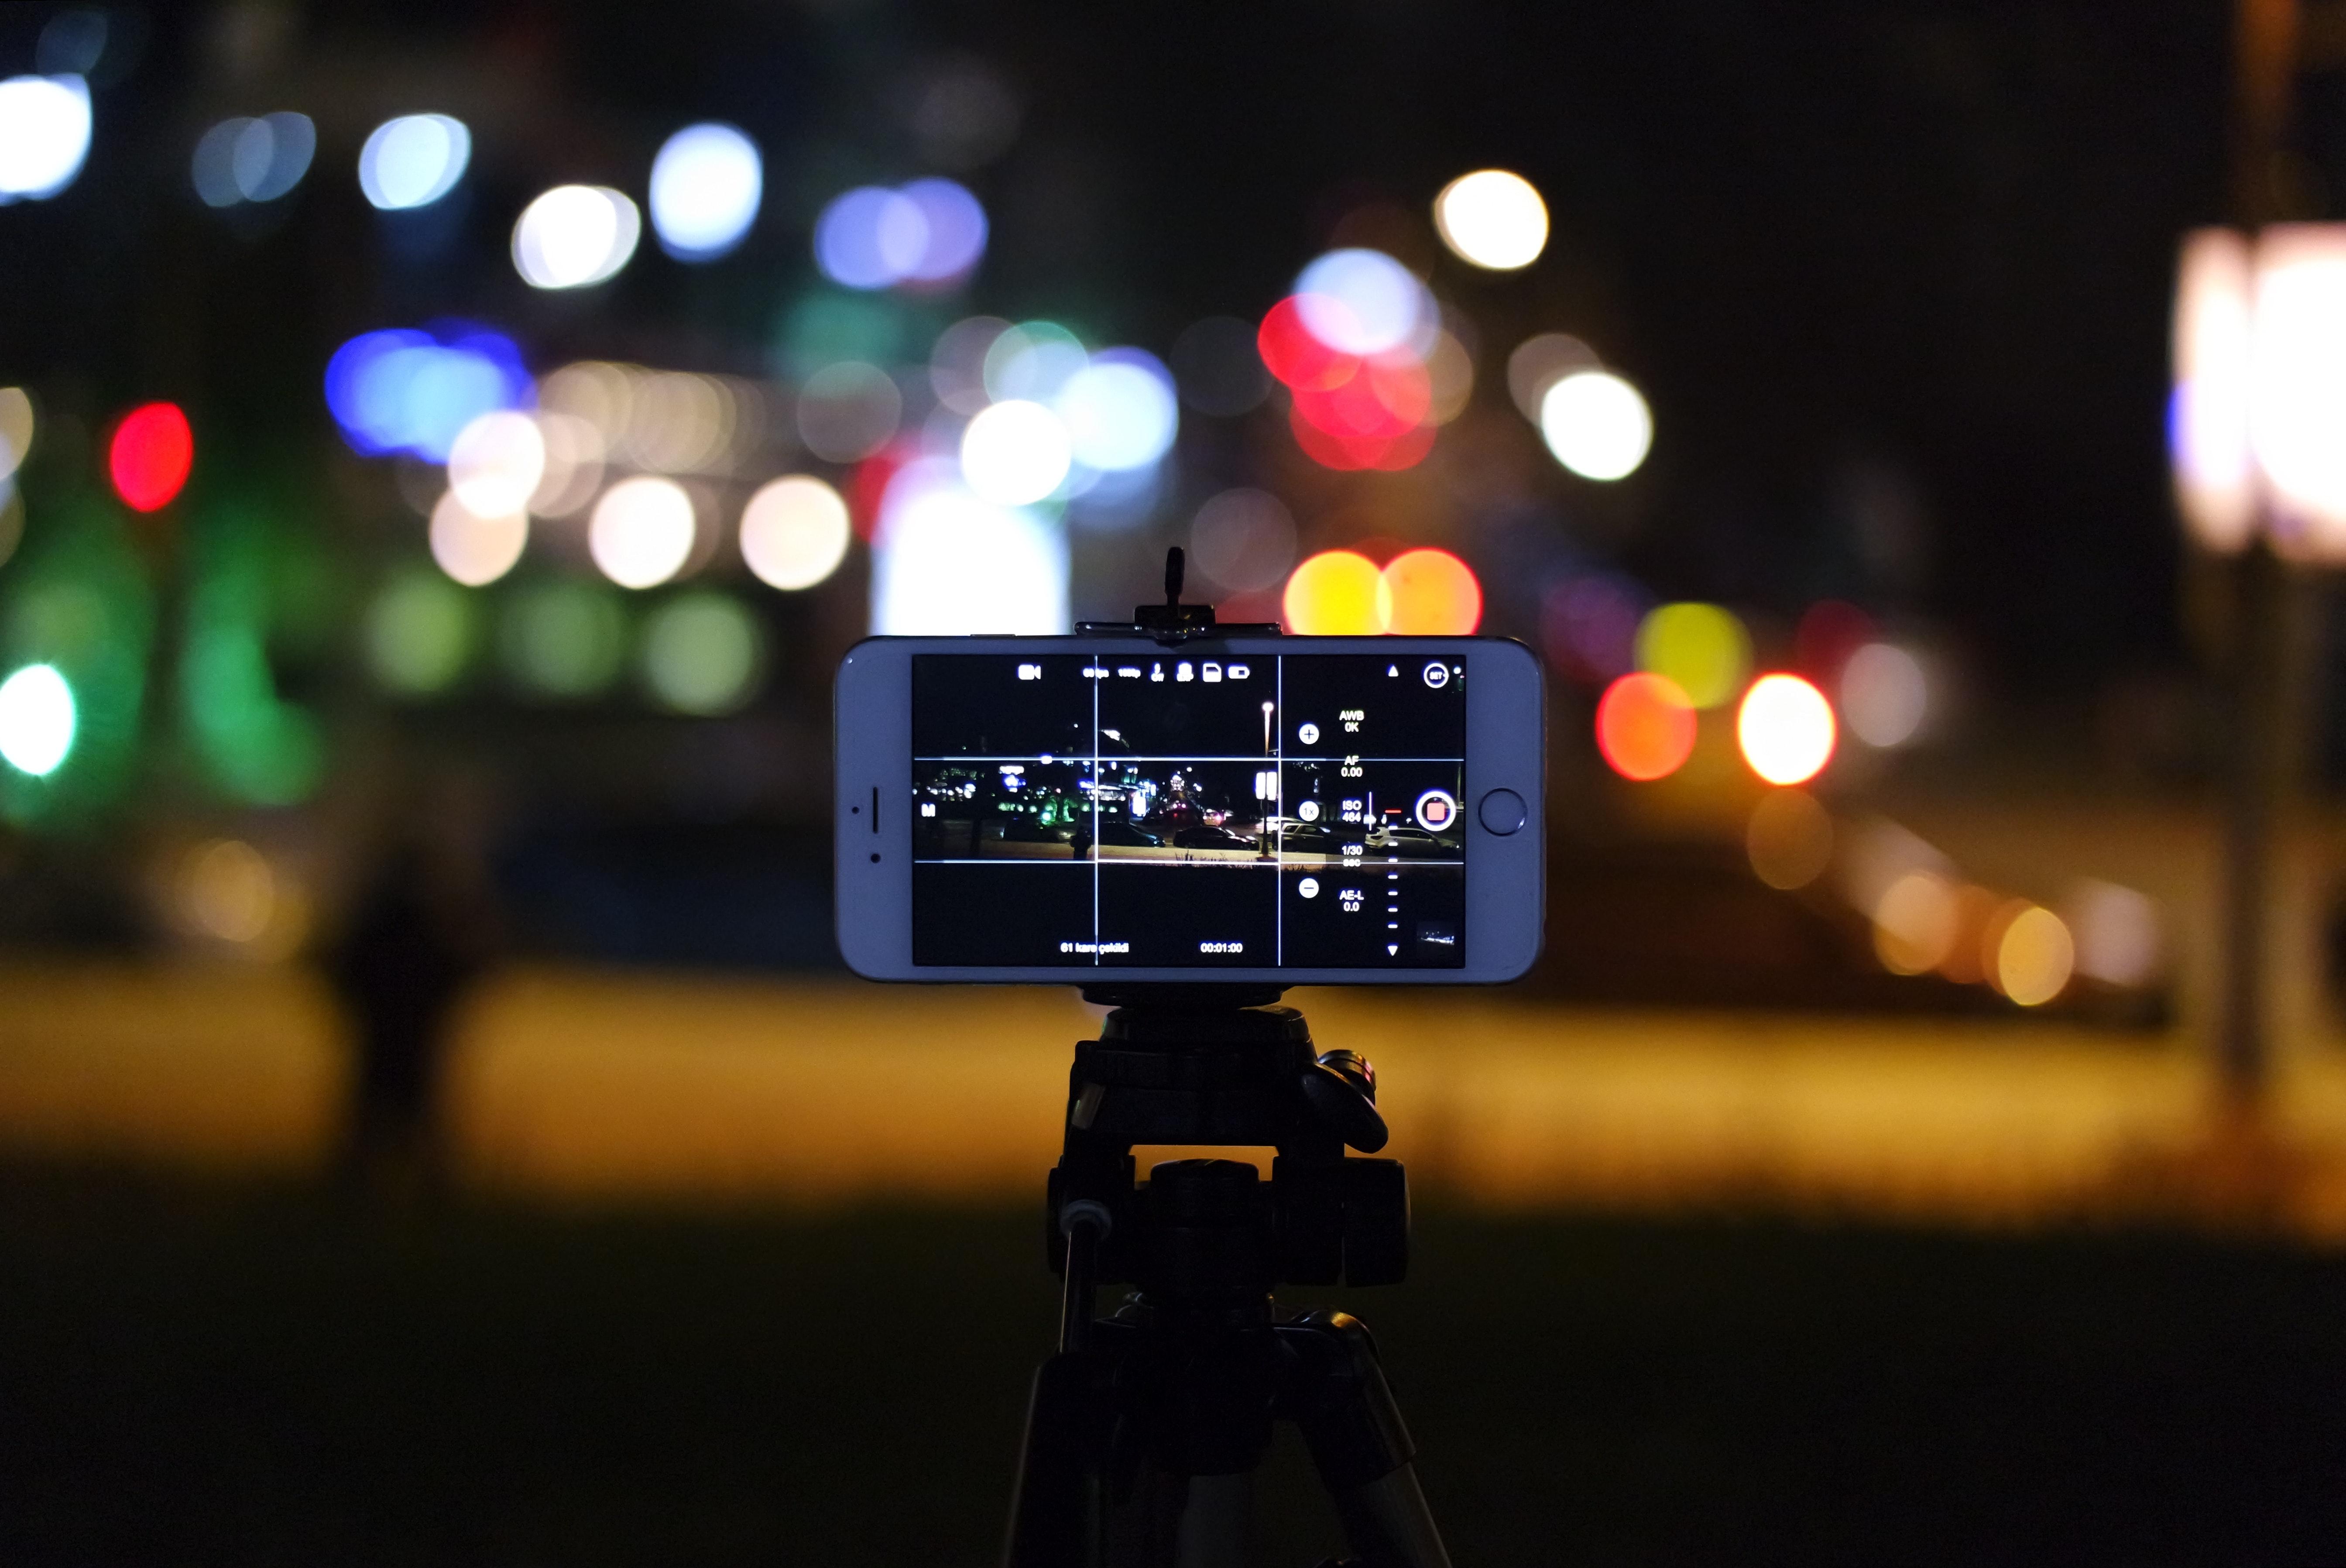 images?q=tbn:ANd9GcQh_l3eQ5xwiPy07kGEXjmjgmBKBRB7H2mRxCGhv1tFWg5c_mWT Best Photography Handphone @http://capturingmomentsphotography.net.info